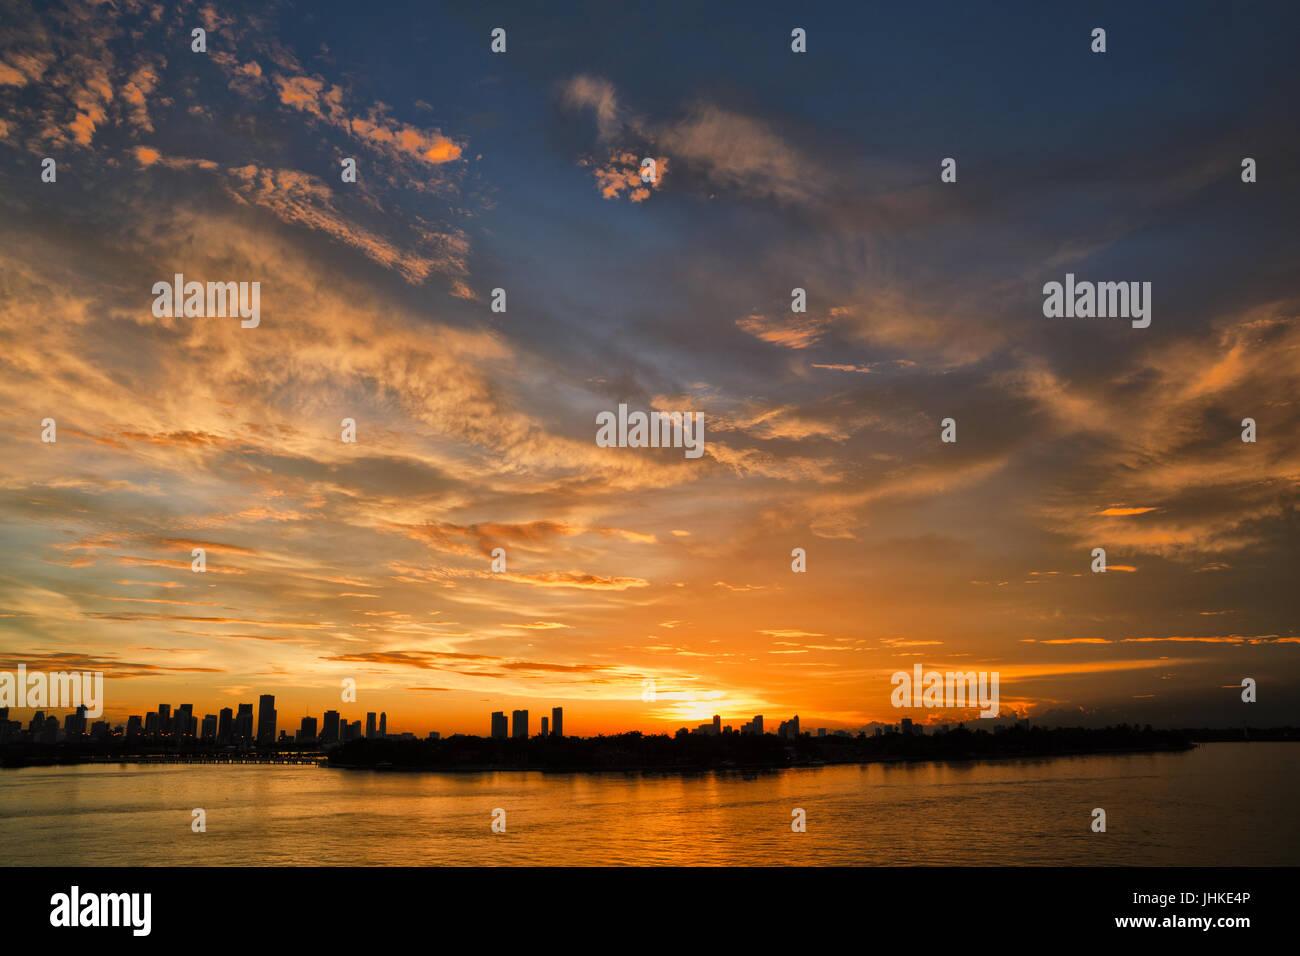 Sunset tiempo en Miami Imagen De Stock